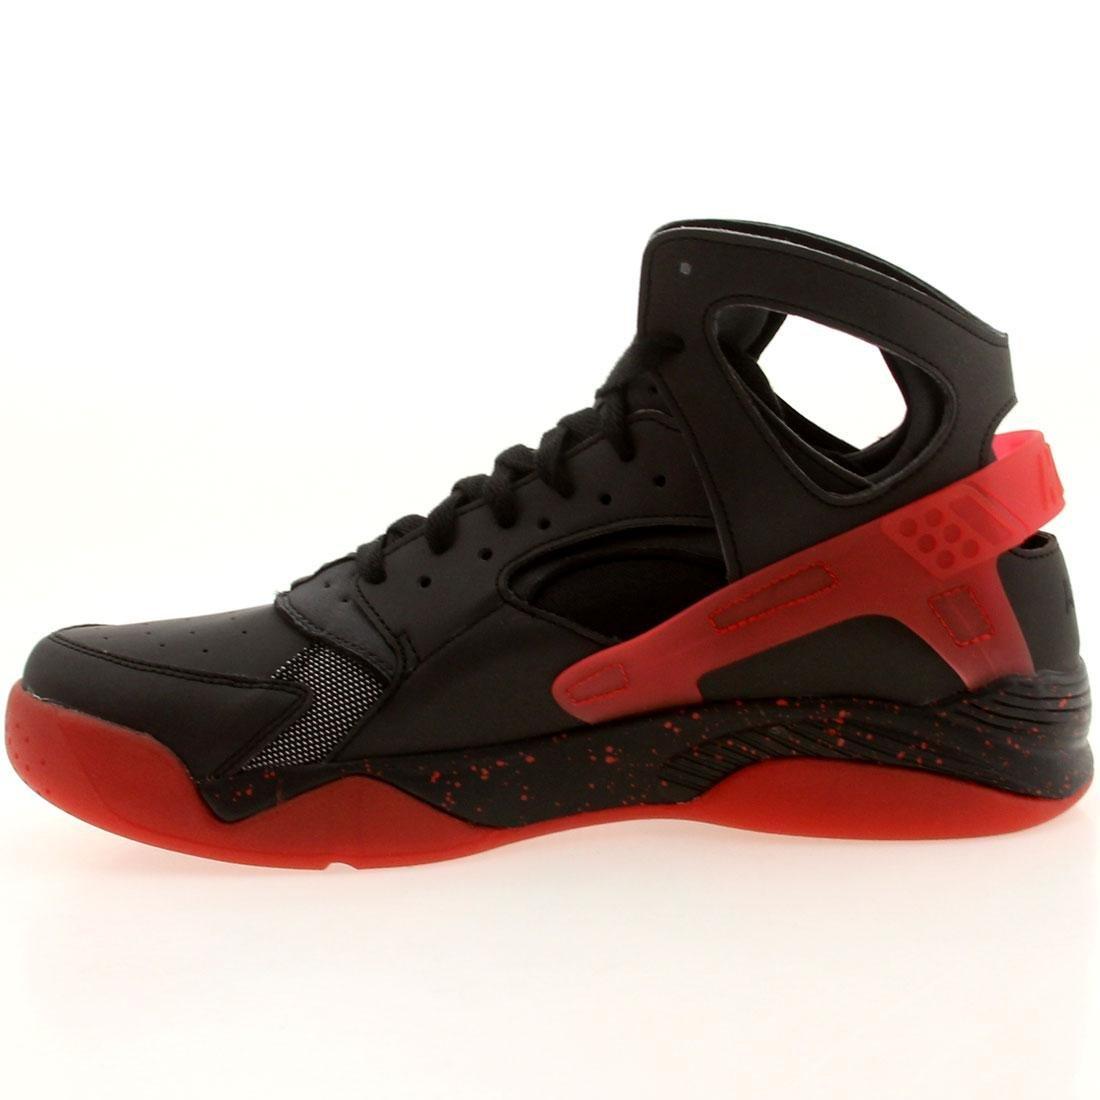 new arrival b52df f0a3e Amazon.com   Nike air Flight Huarache Mens hi top Trainers 705005 Sneakers  Shoes   Basketball